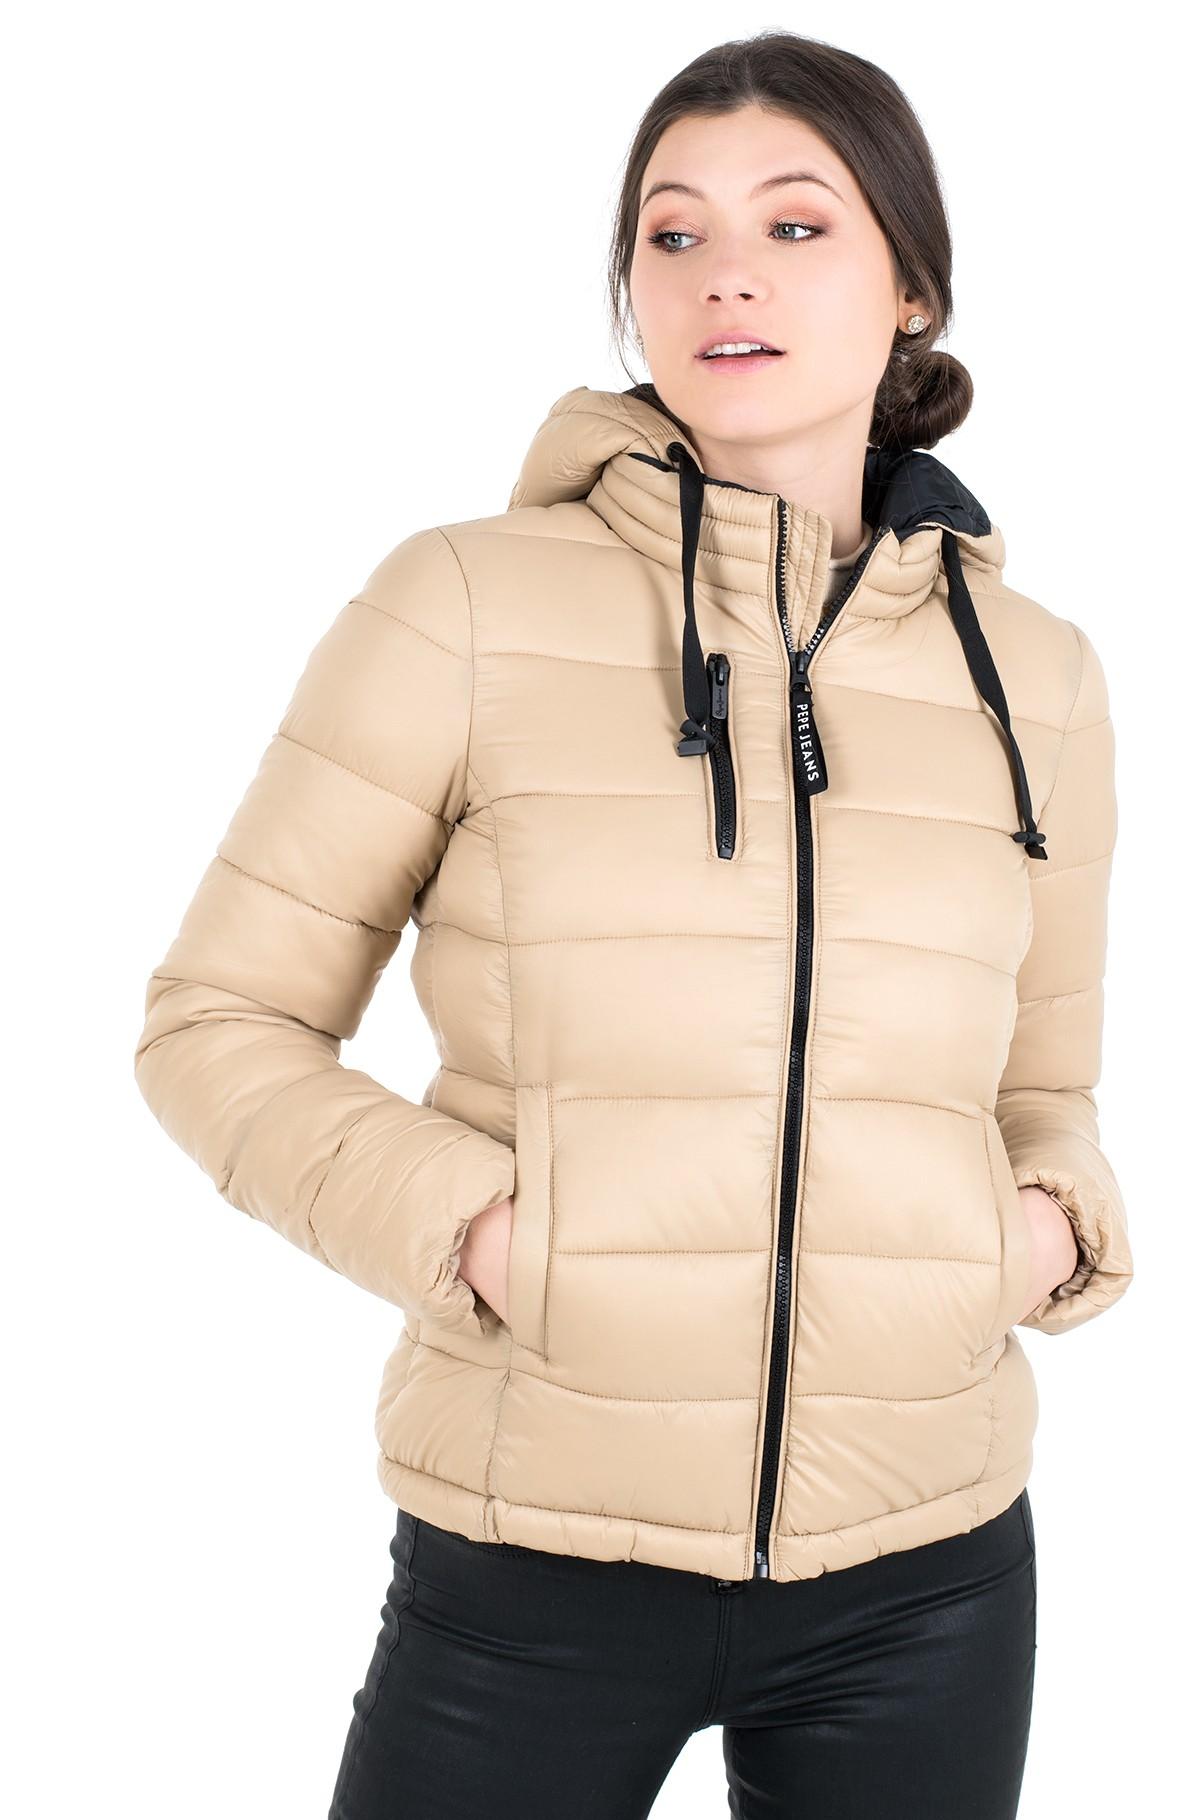 Jacket CATA/PL401852-full-1